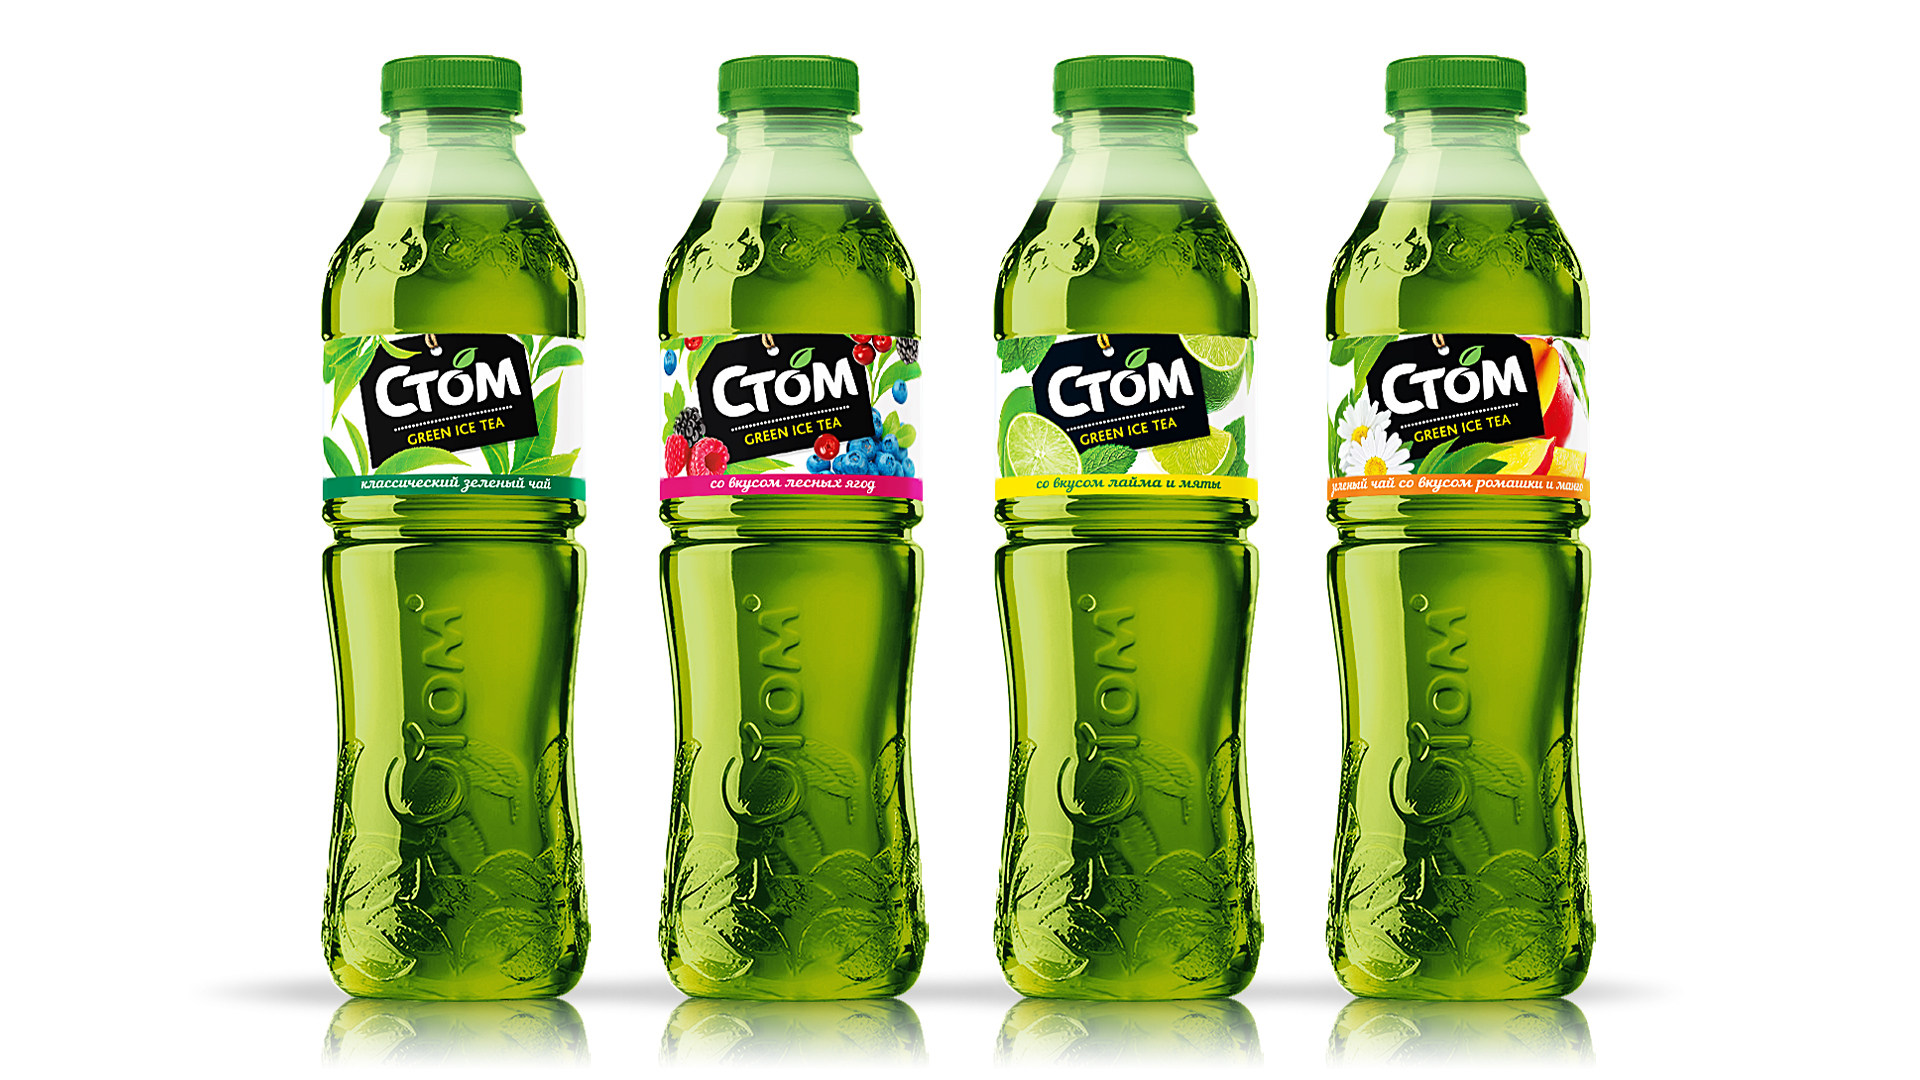 Asgard Branding, дизайн товарной марки, label design, product design, fruit tea, rebranding, logo design, green ice tea